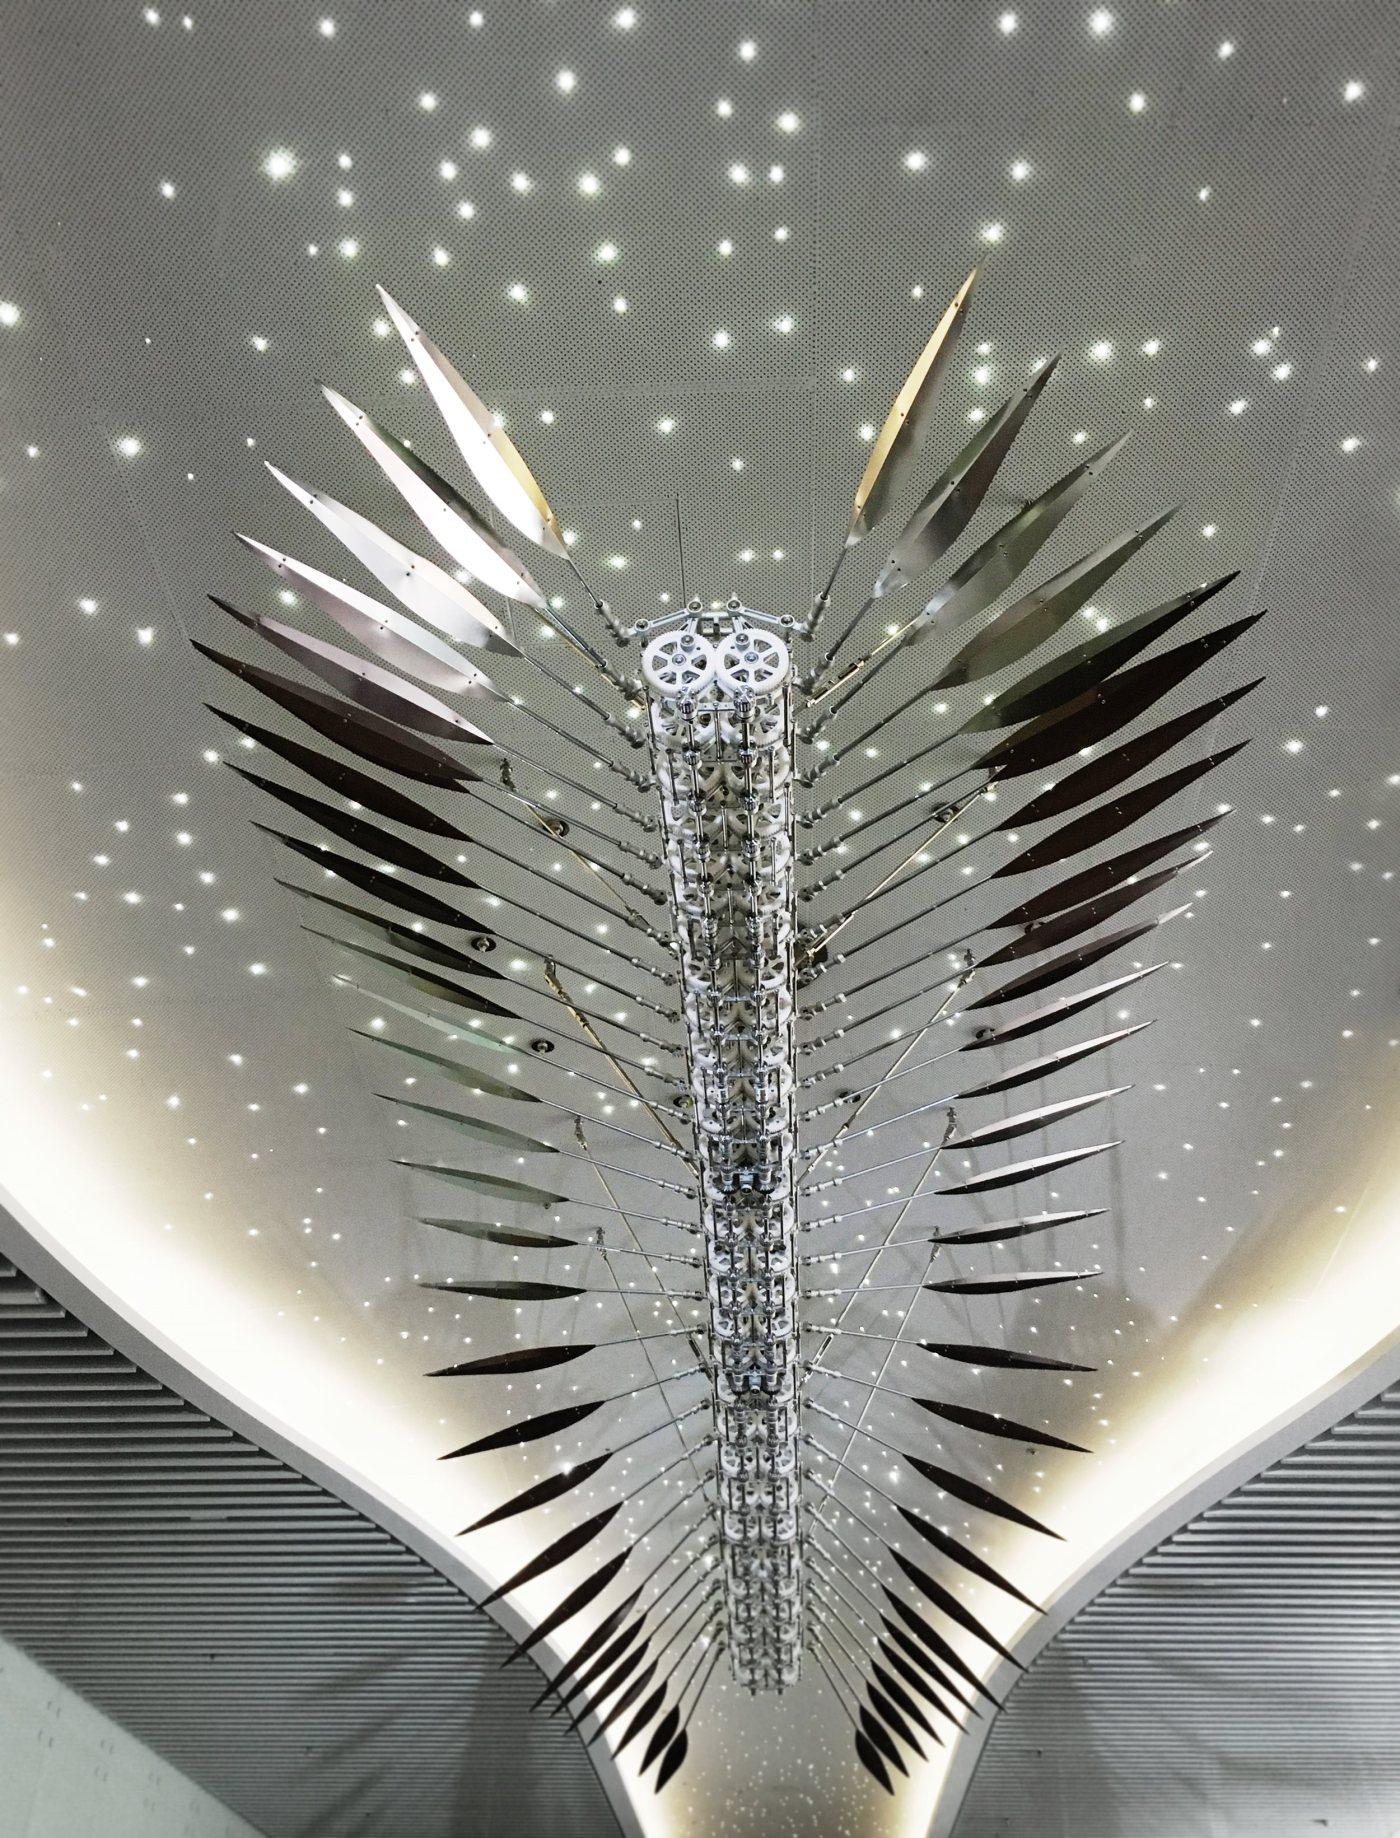 豪華朗機工,漫遊-羽,2016,動力機械裝置(不鏽鋼、鋁合金、玻璃纖維碳纖複合、馬達),717(L) x 248(W) x 140(H) cm LuxuryLogico, Wandering: Feather, 2016, Kinetic Sculpture (Stainless steel, aluminum alloy, Carbon fiber rod, motor), 717(L) x 248(W) x 140(H) cm